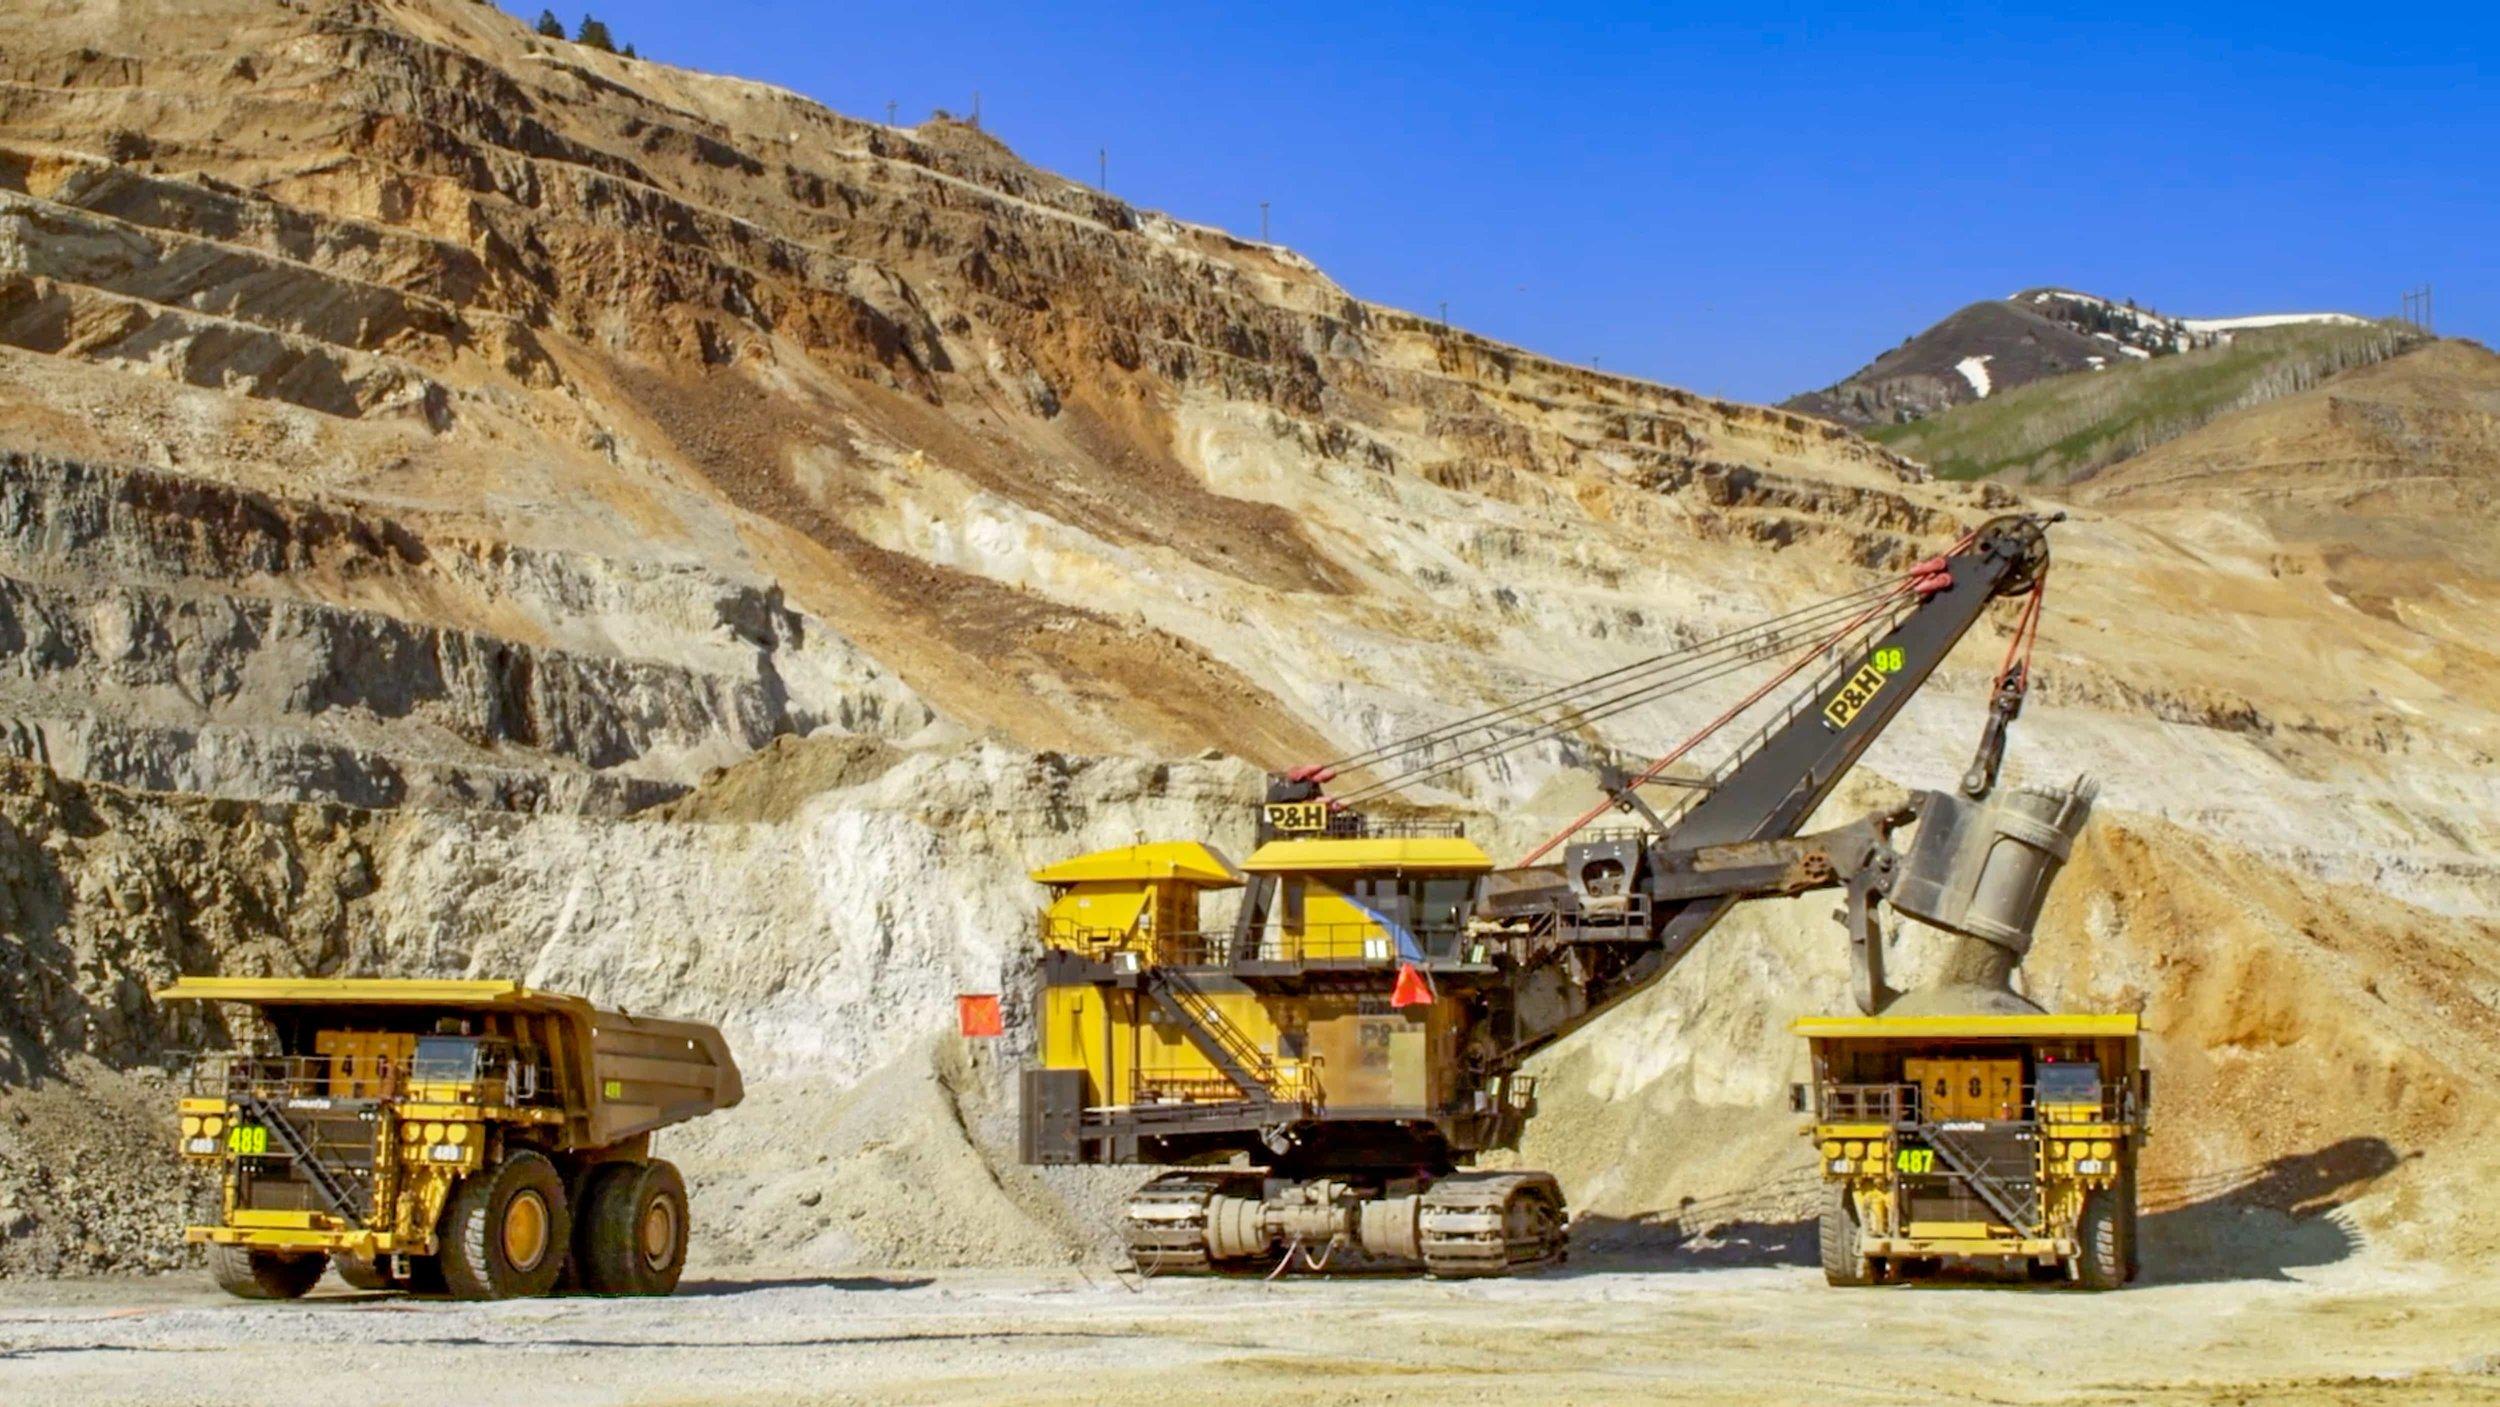 Visit the Kennecott Copper Mine